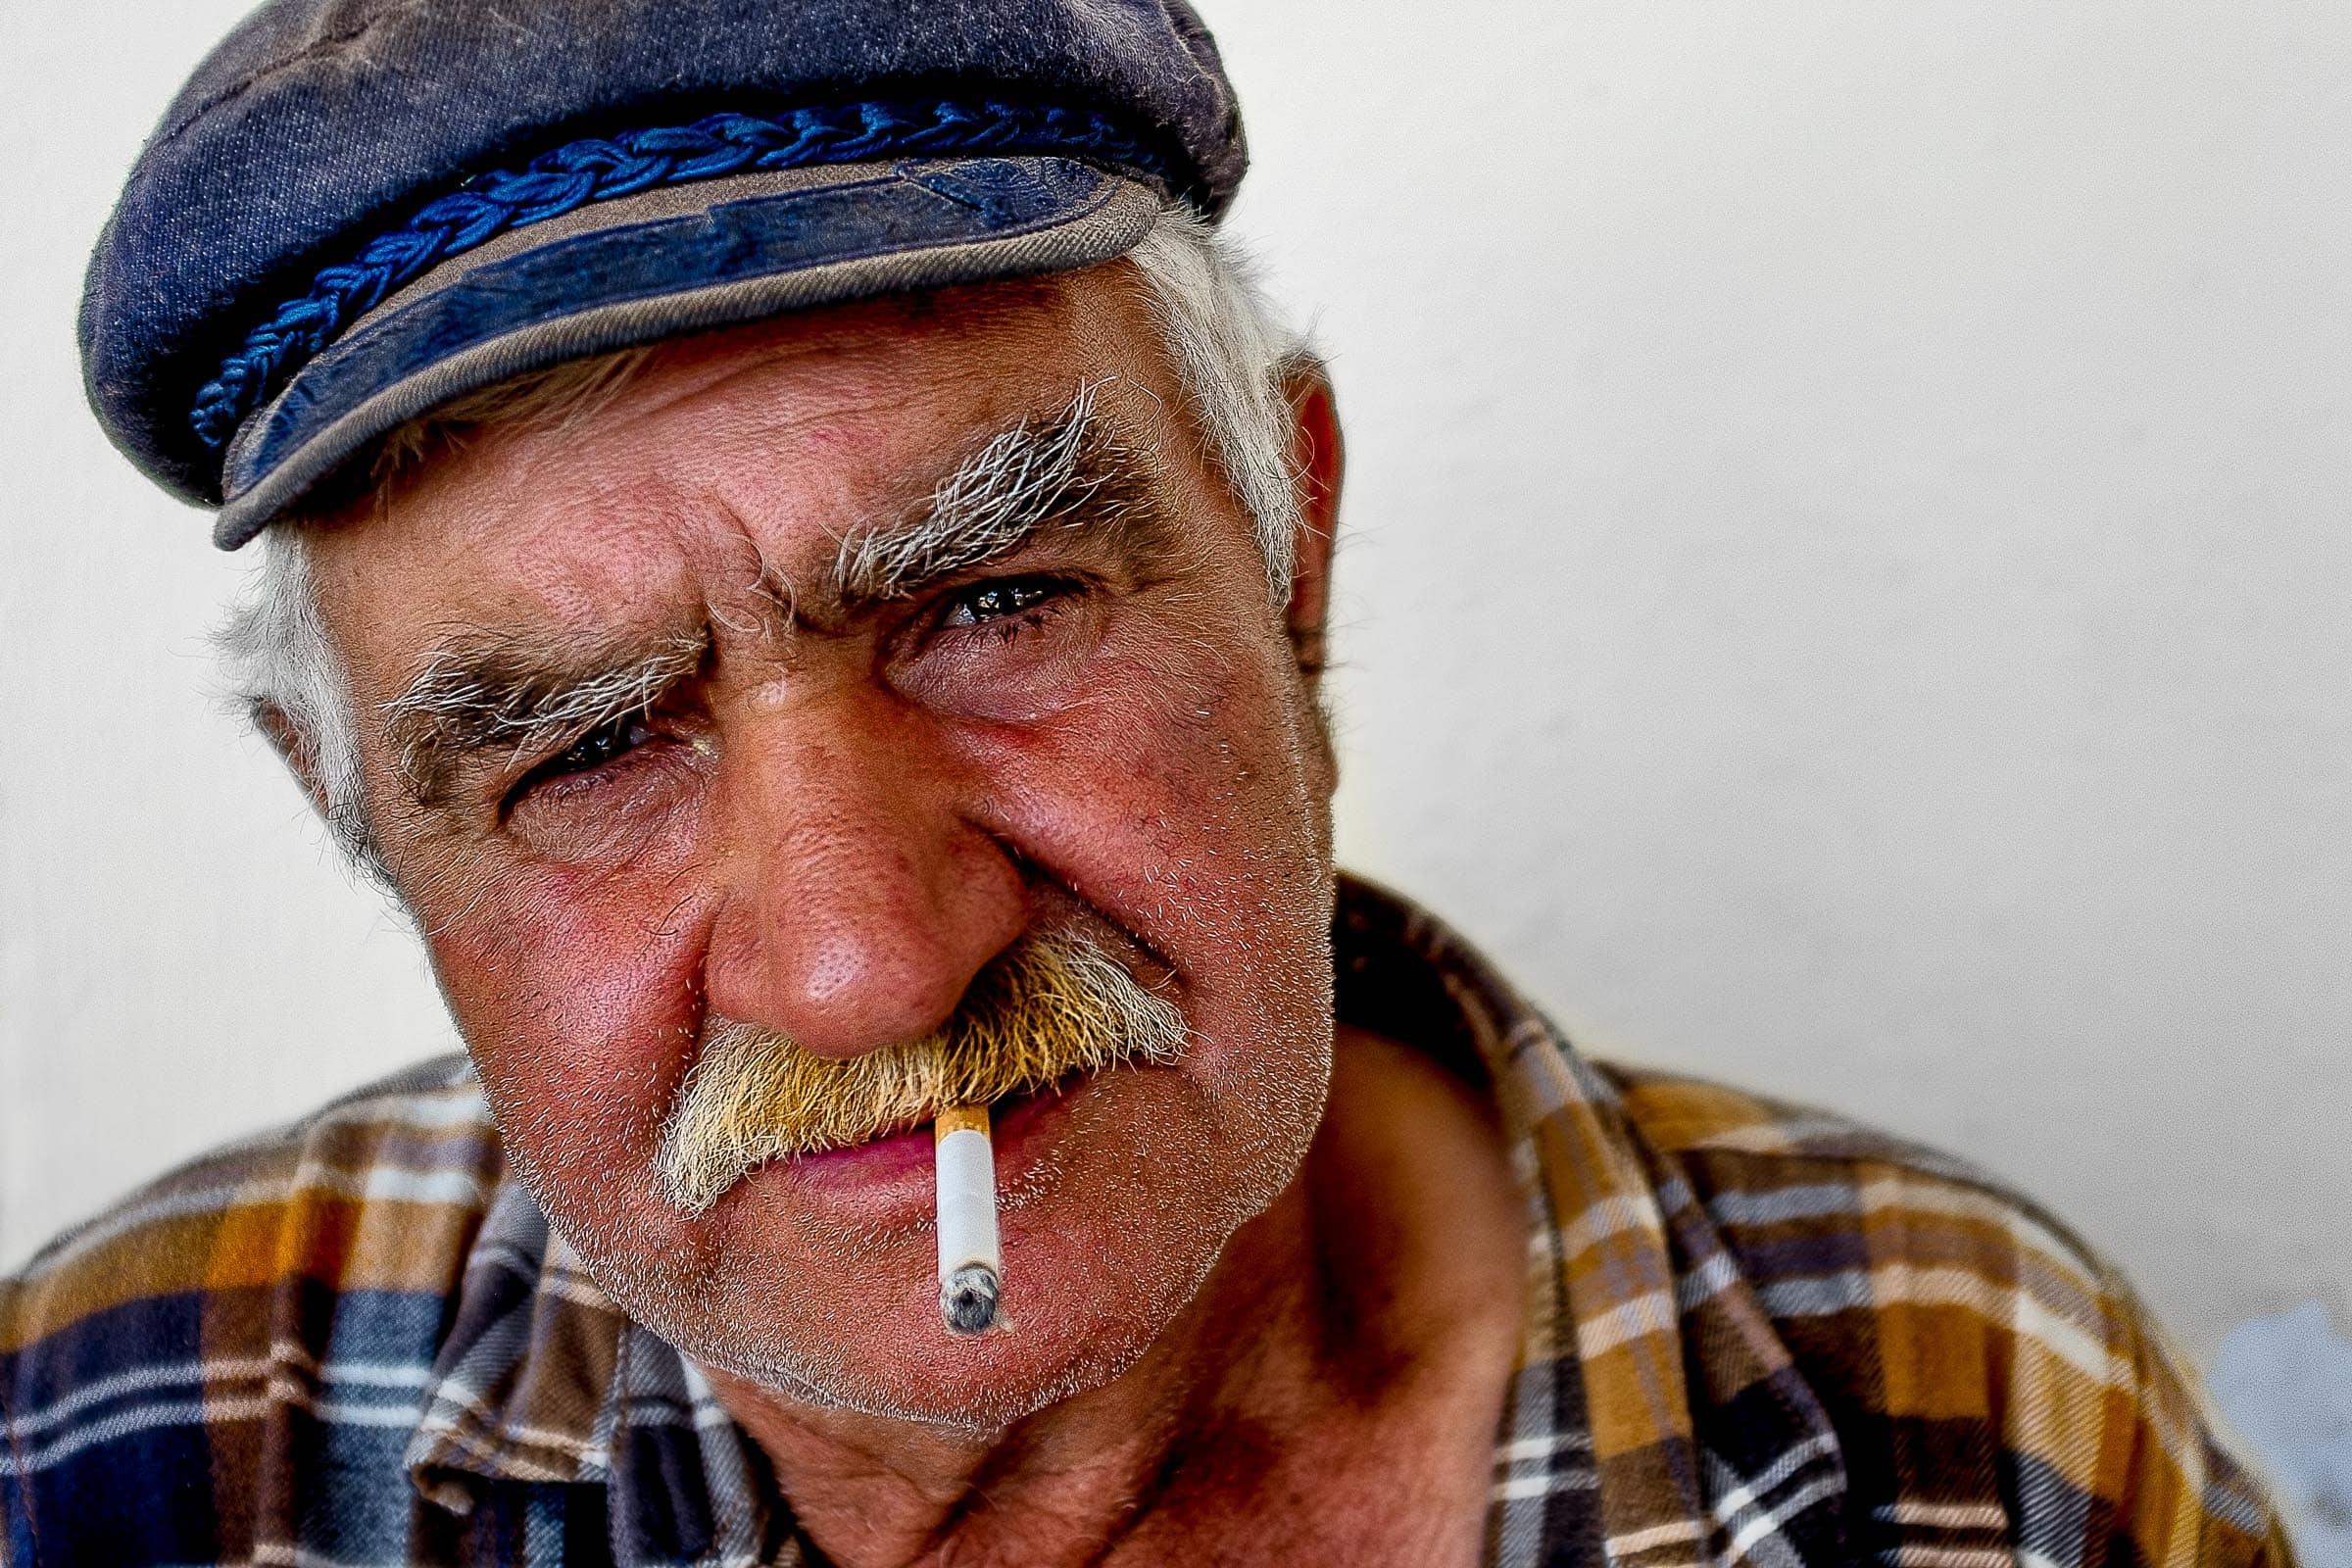 Portrait of an old man donkey caretaker in Greece while photographers explore Santorini Engagement photo ideas